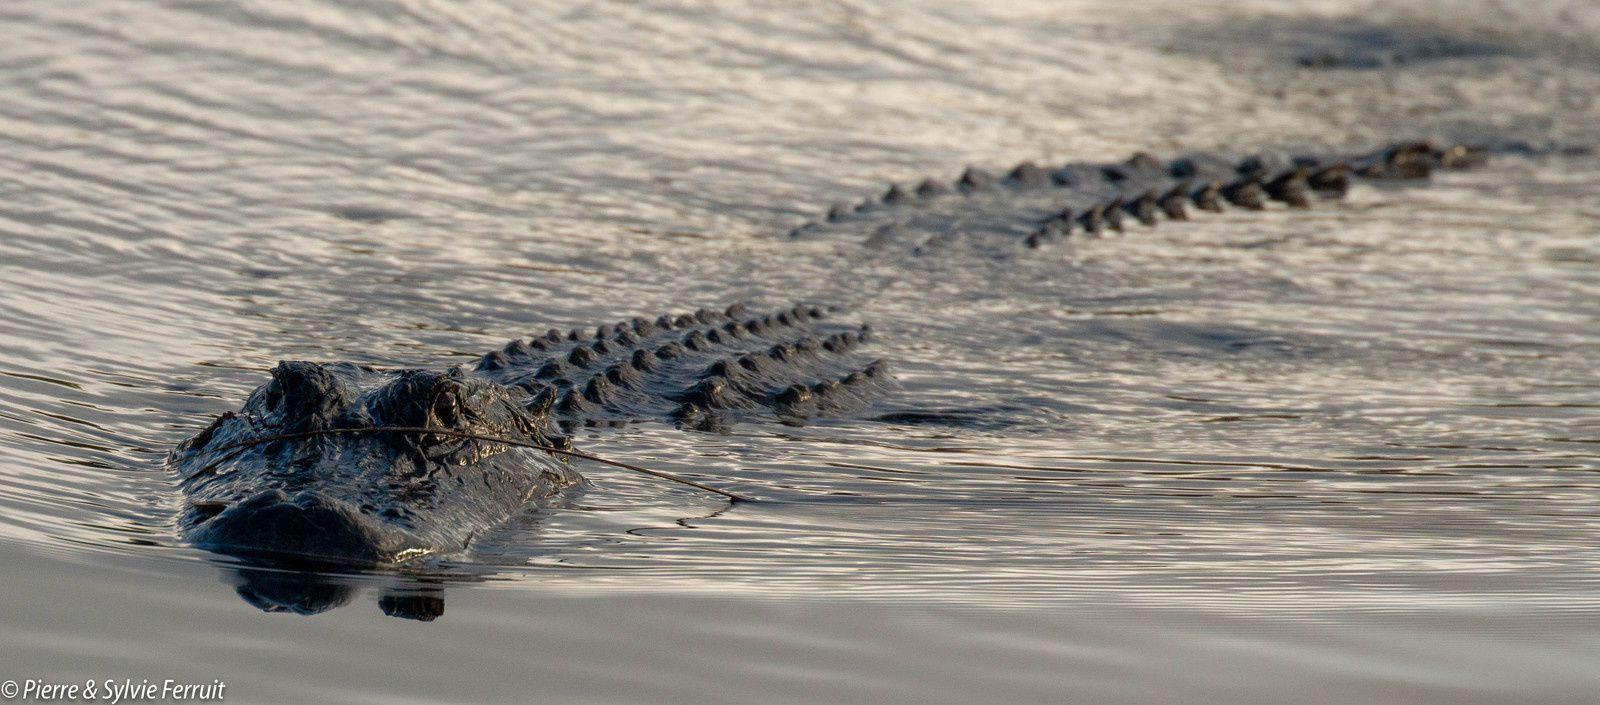 Alligator - Everglades National Park - Florida